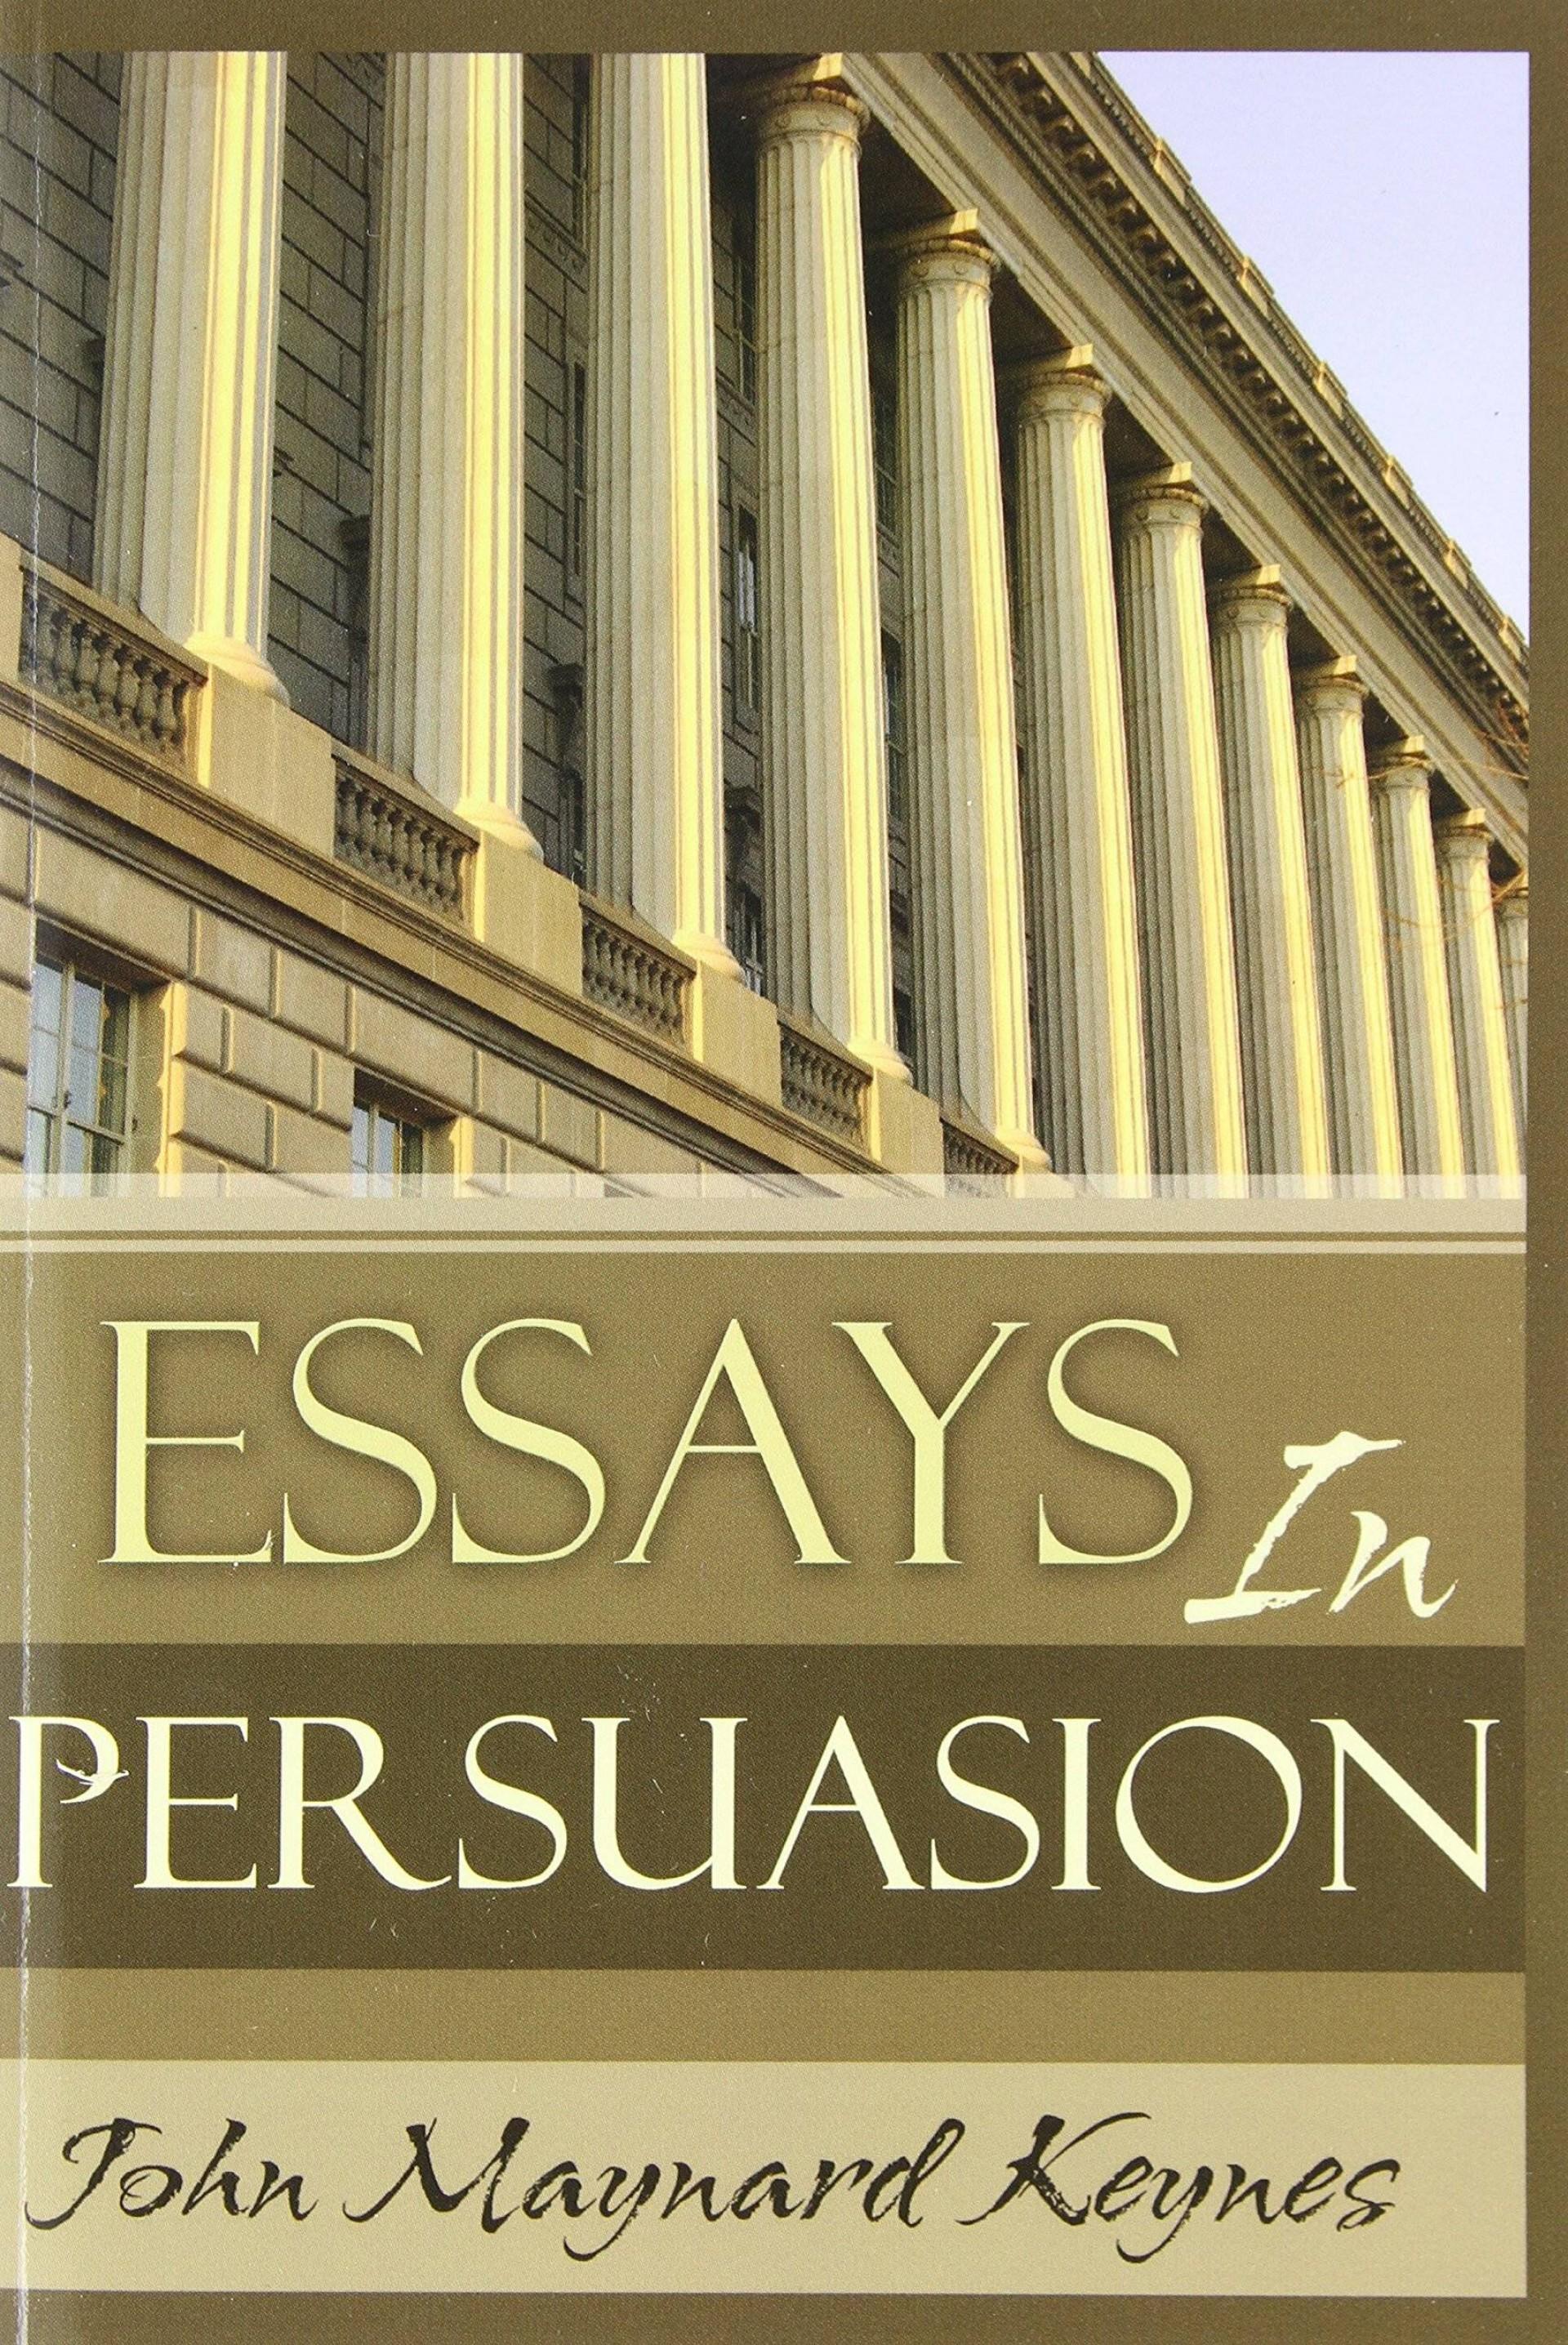 007 Essay Example Essays In Persuasion By John Maynard Remarkable Audiobook Pdf Keynes Summary 1920